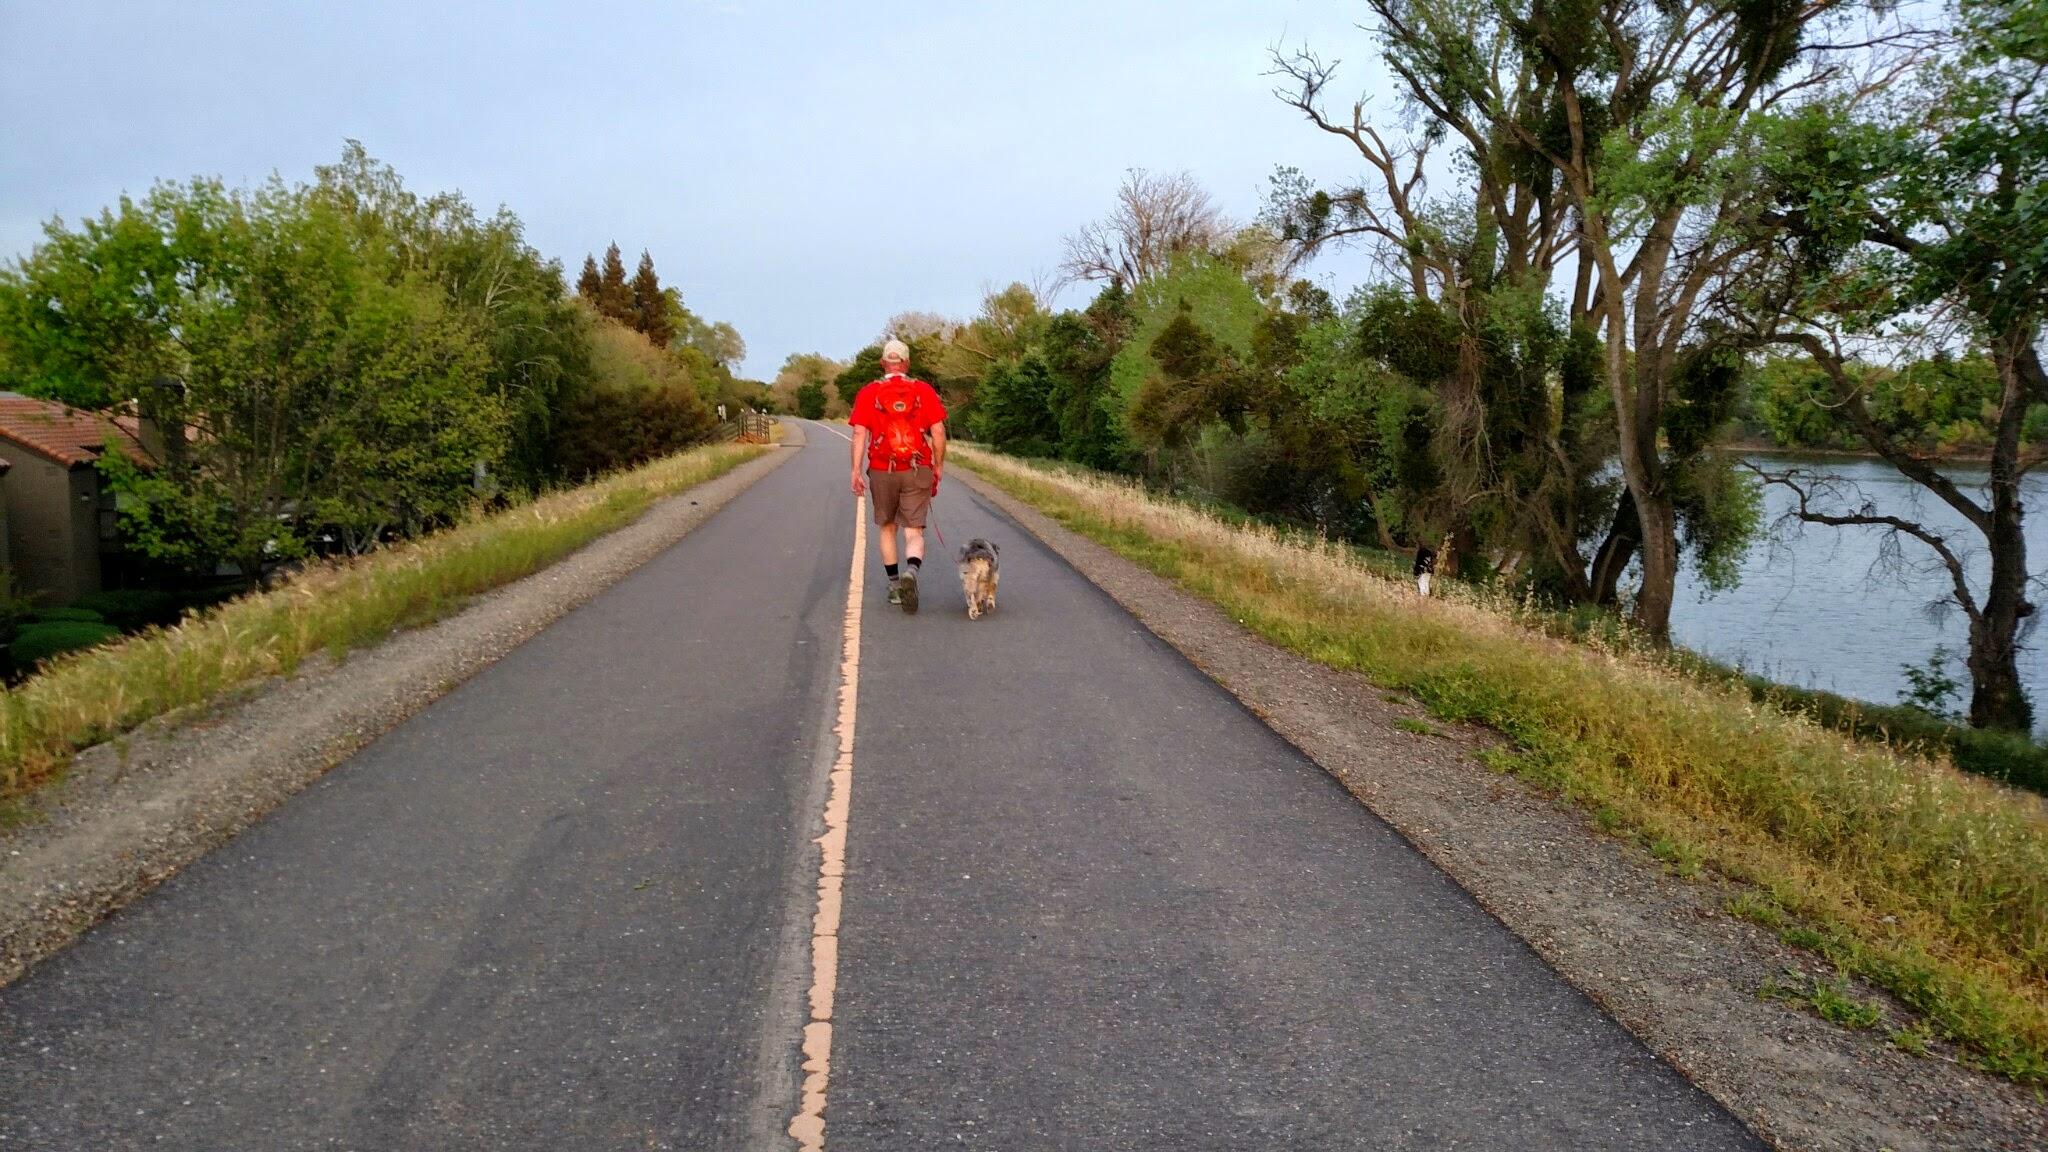 Walking our dog on the Sacramento River Bike Trail. www.chibeingchi.com